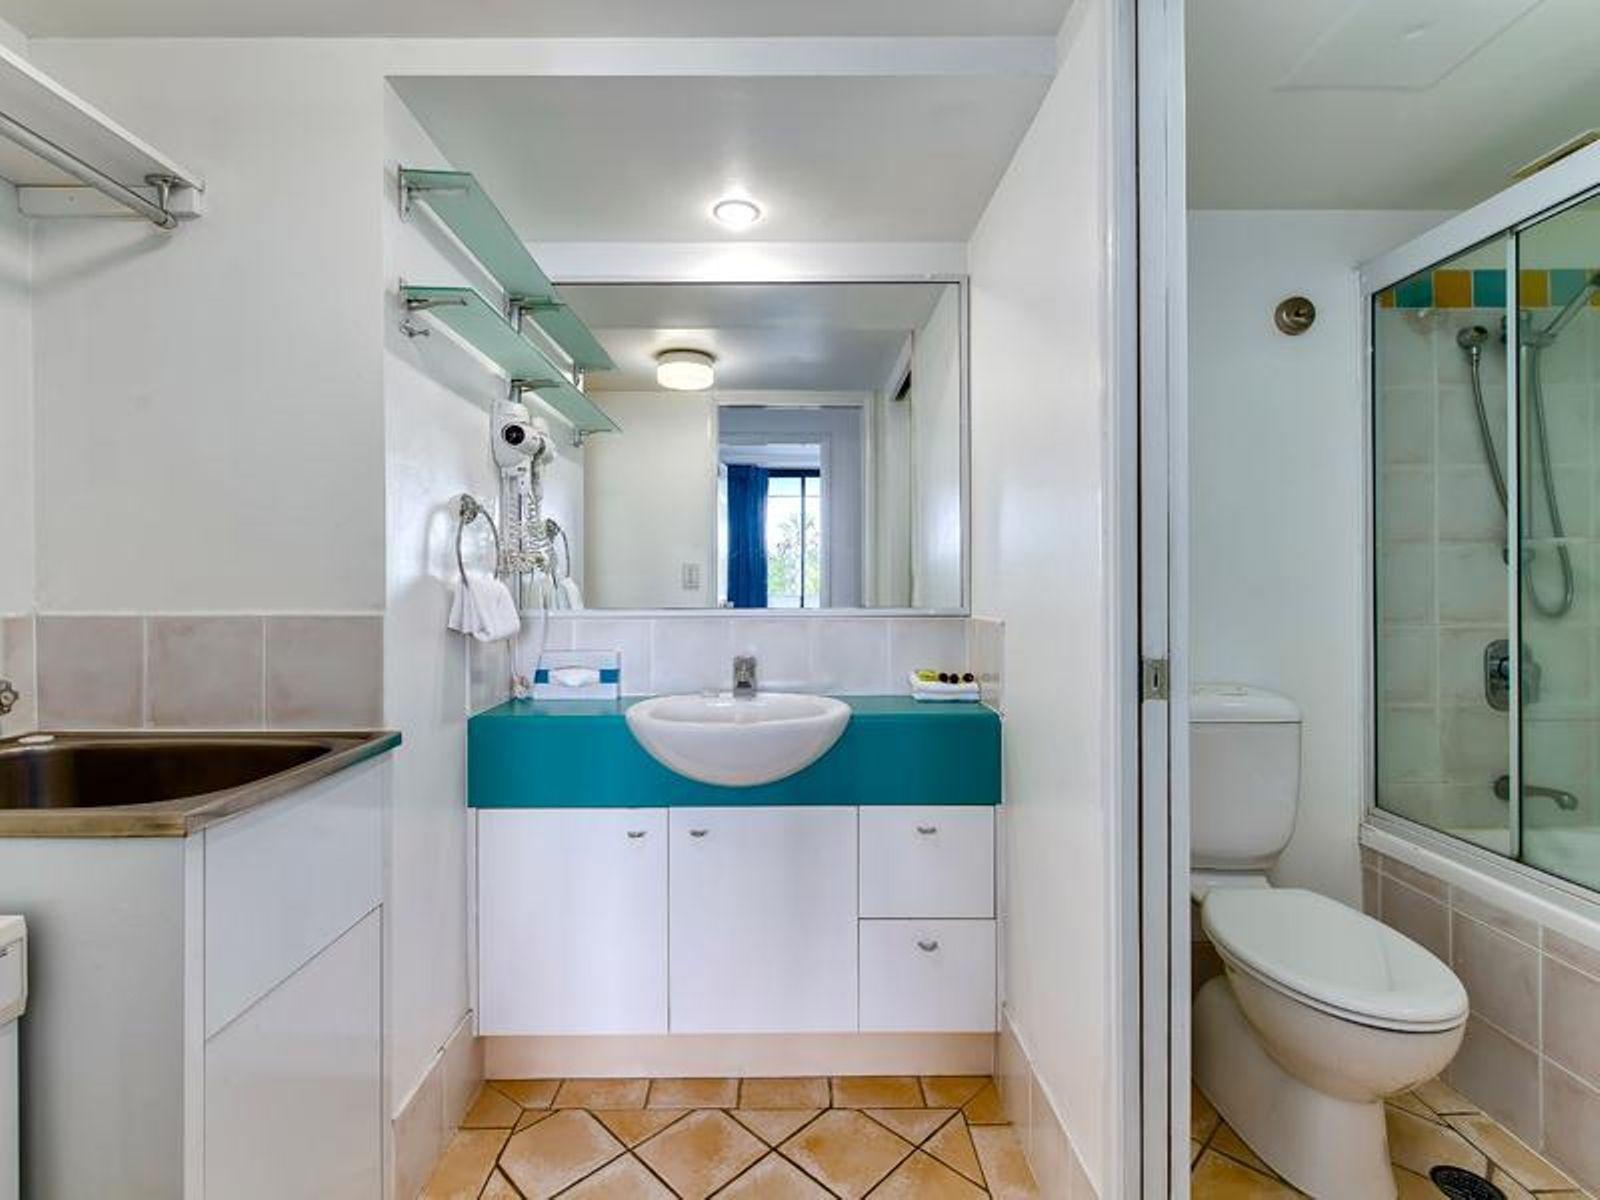 219/220 Melbourne Street, South Brisbane, QLD 4101